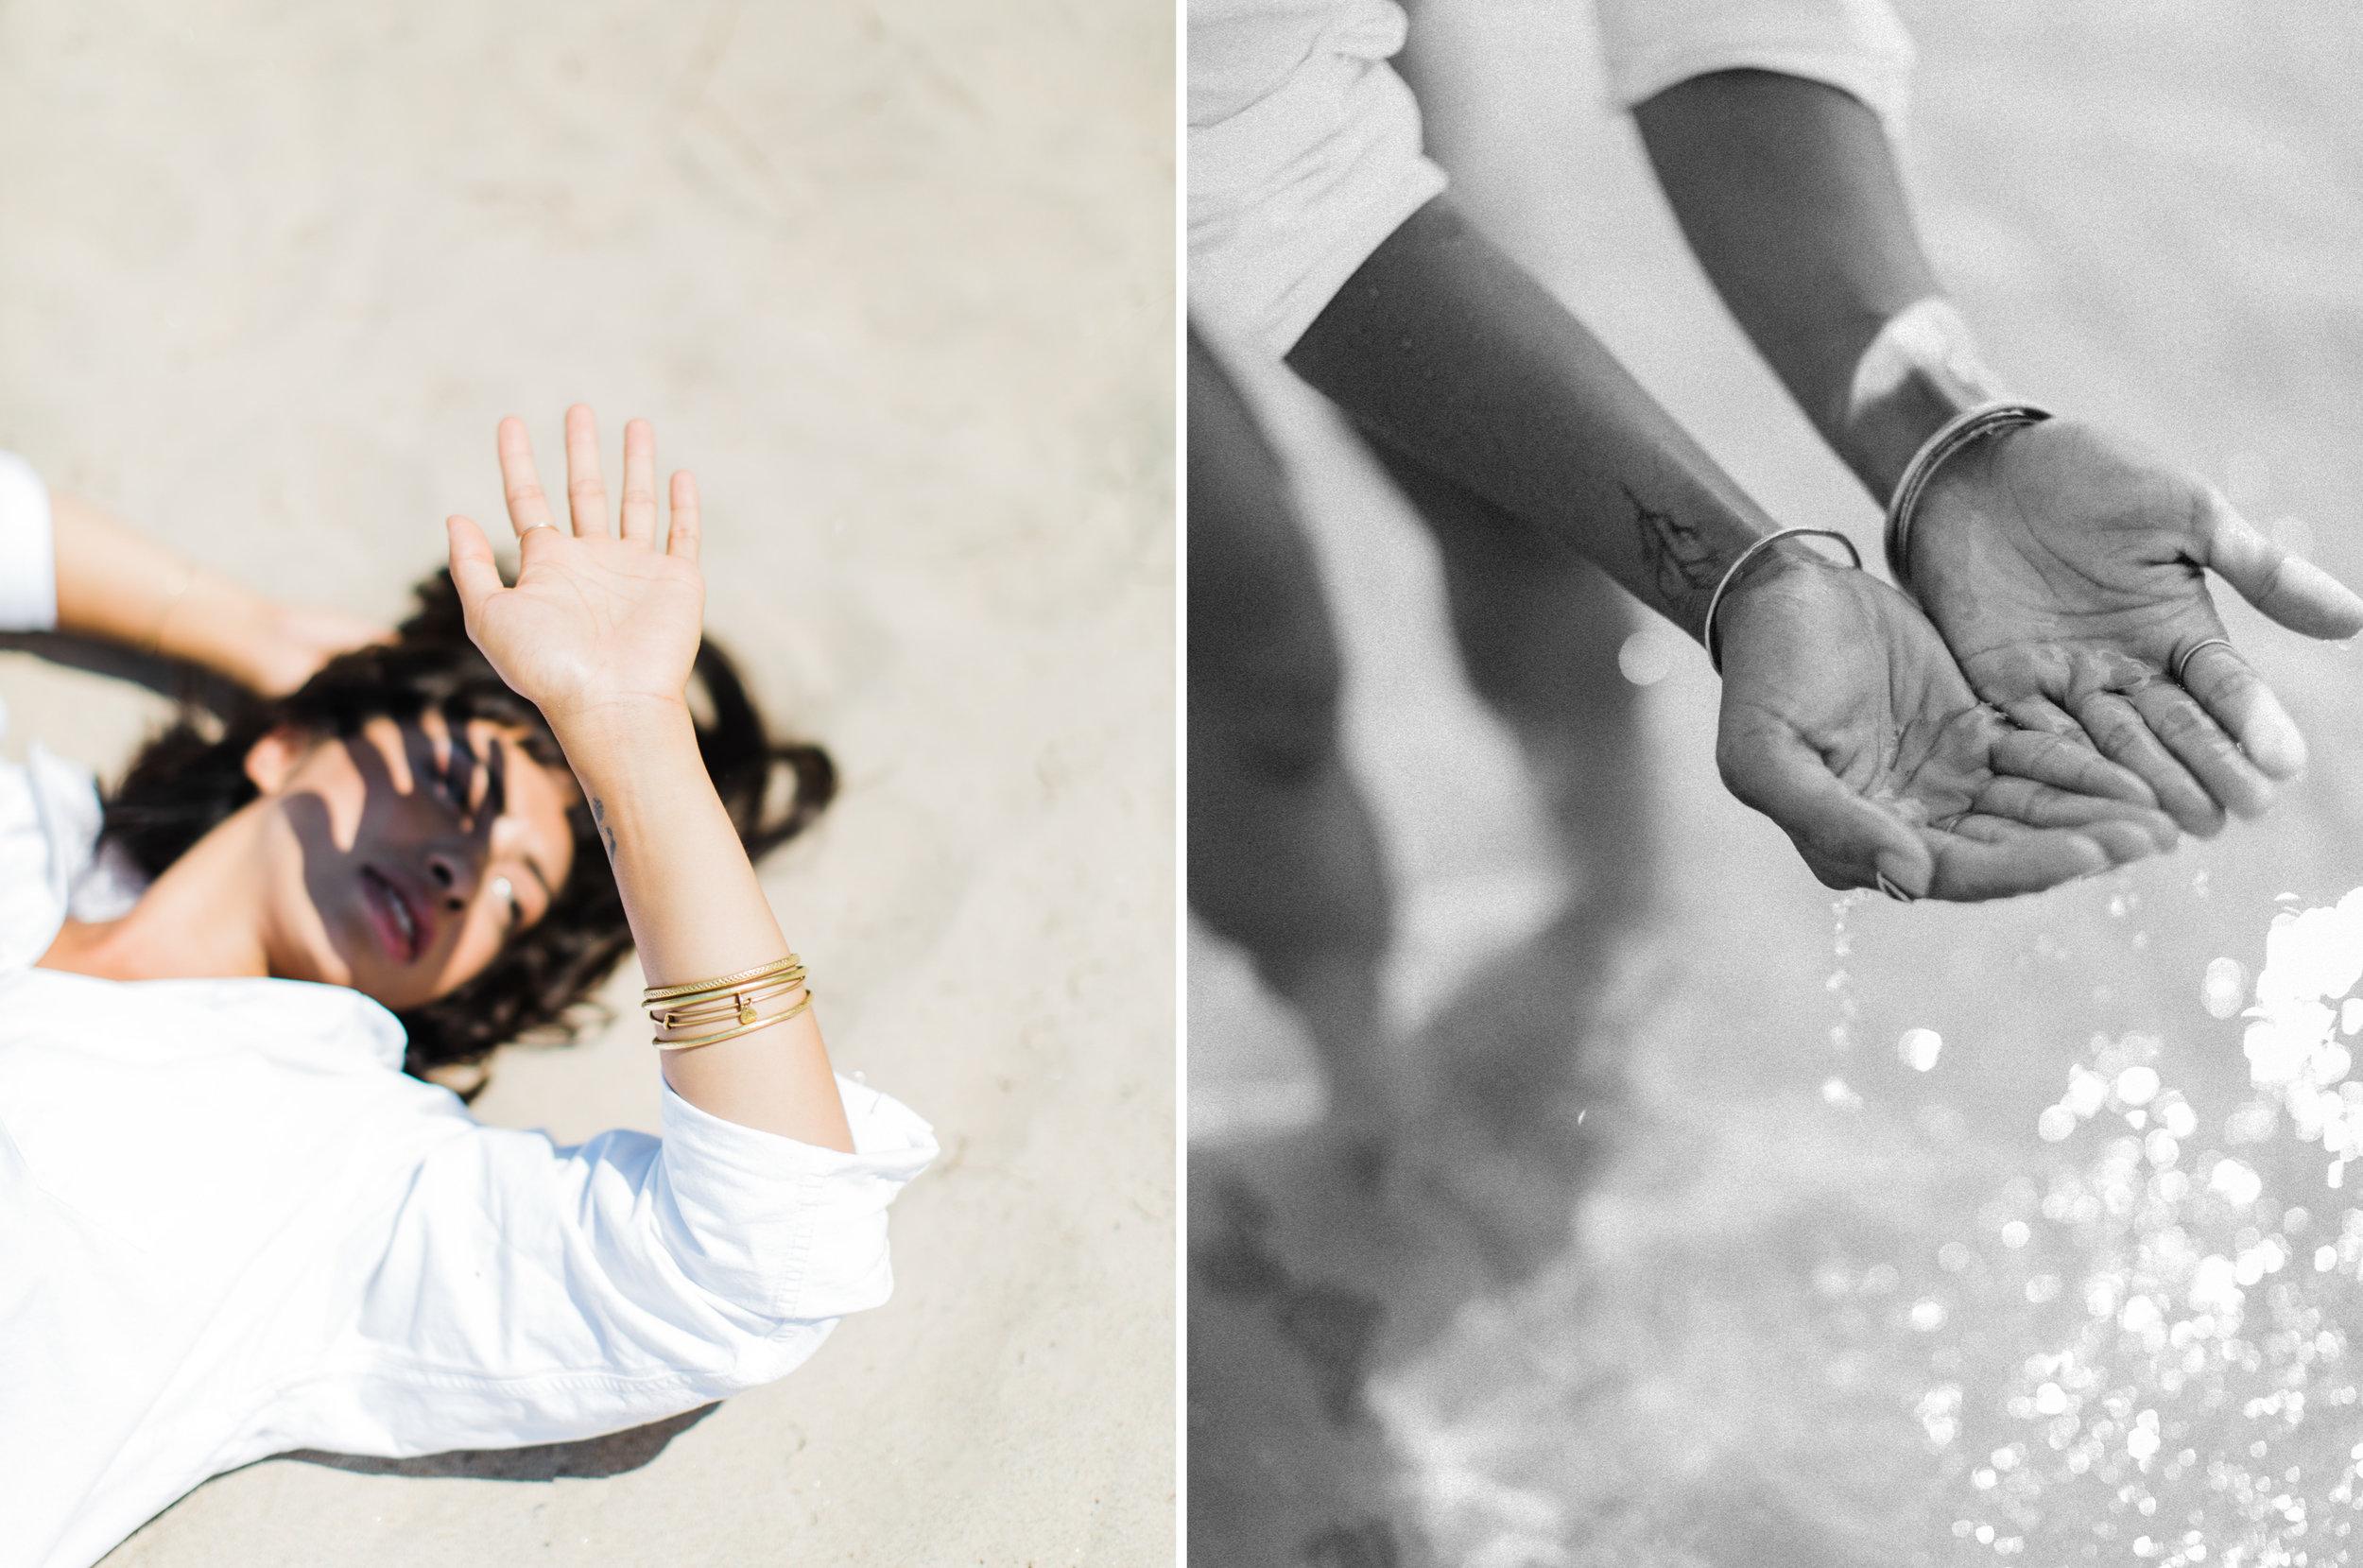 toronto_wedding_photographer_beach_fine_art4.jpg